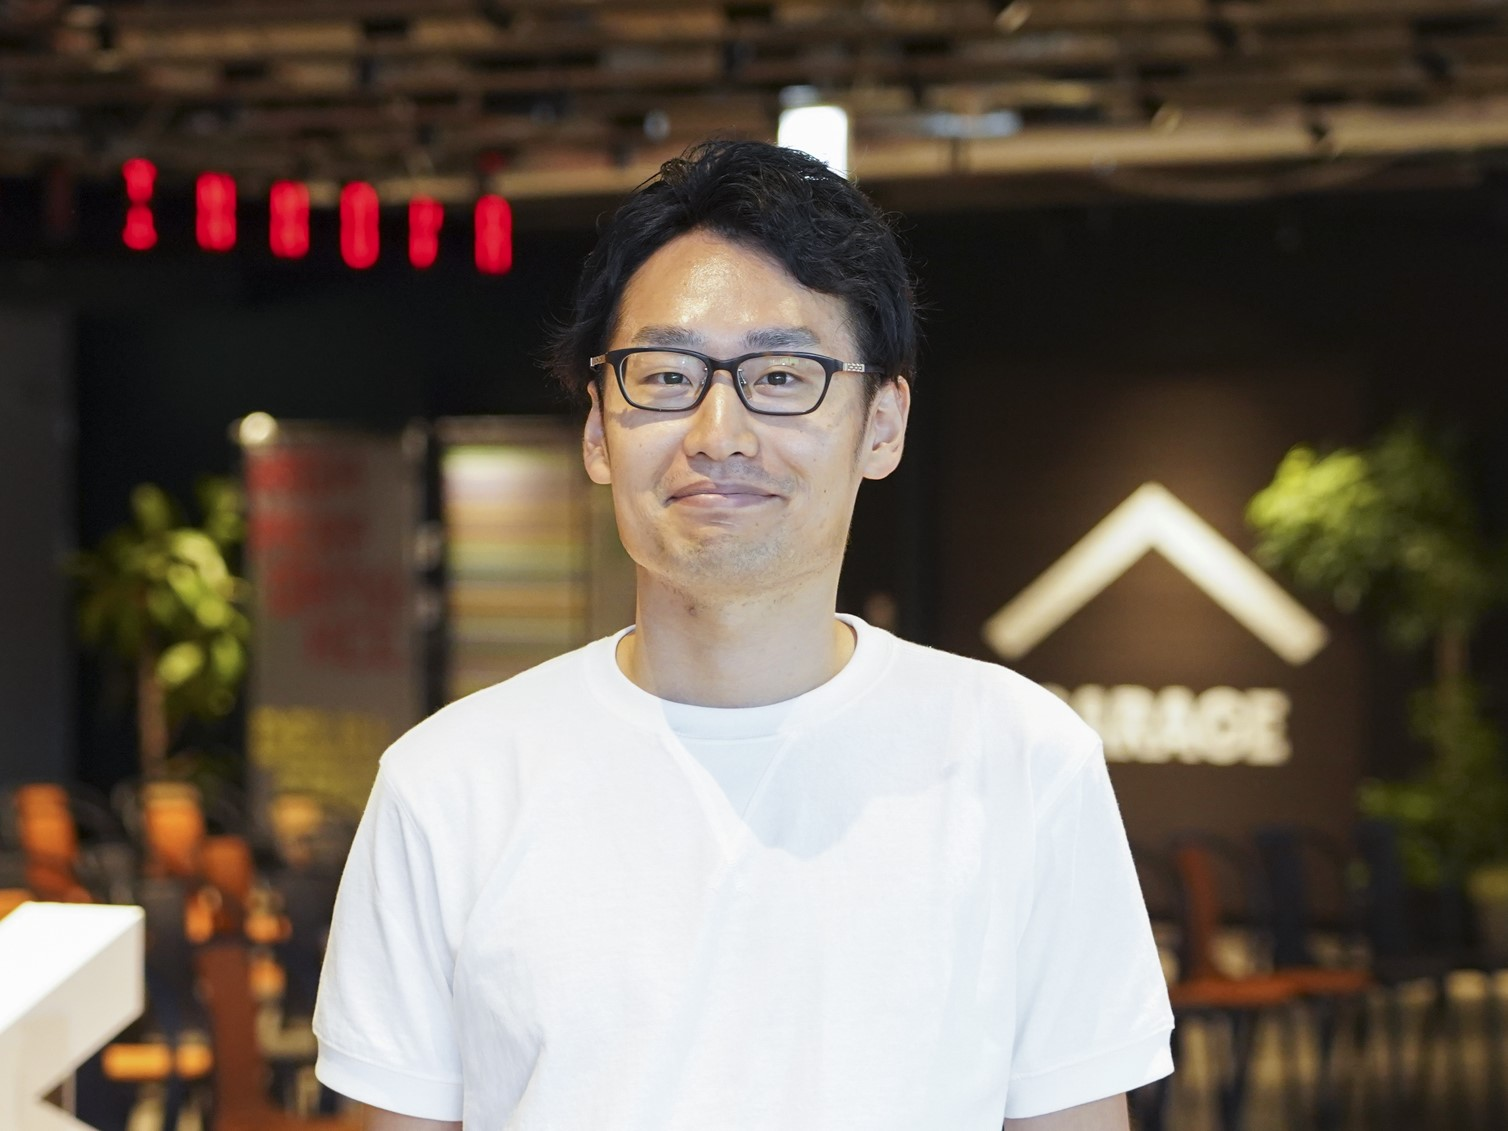 Hirofumi(マネジメントコンサルタント、シニア・マネジャー)